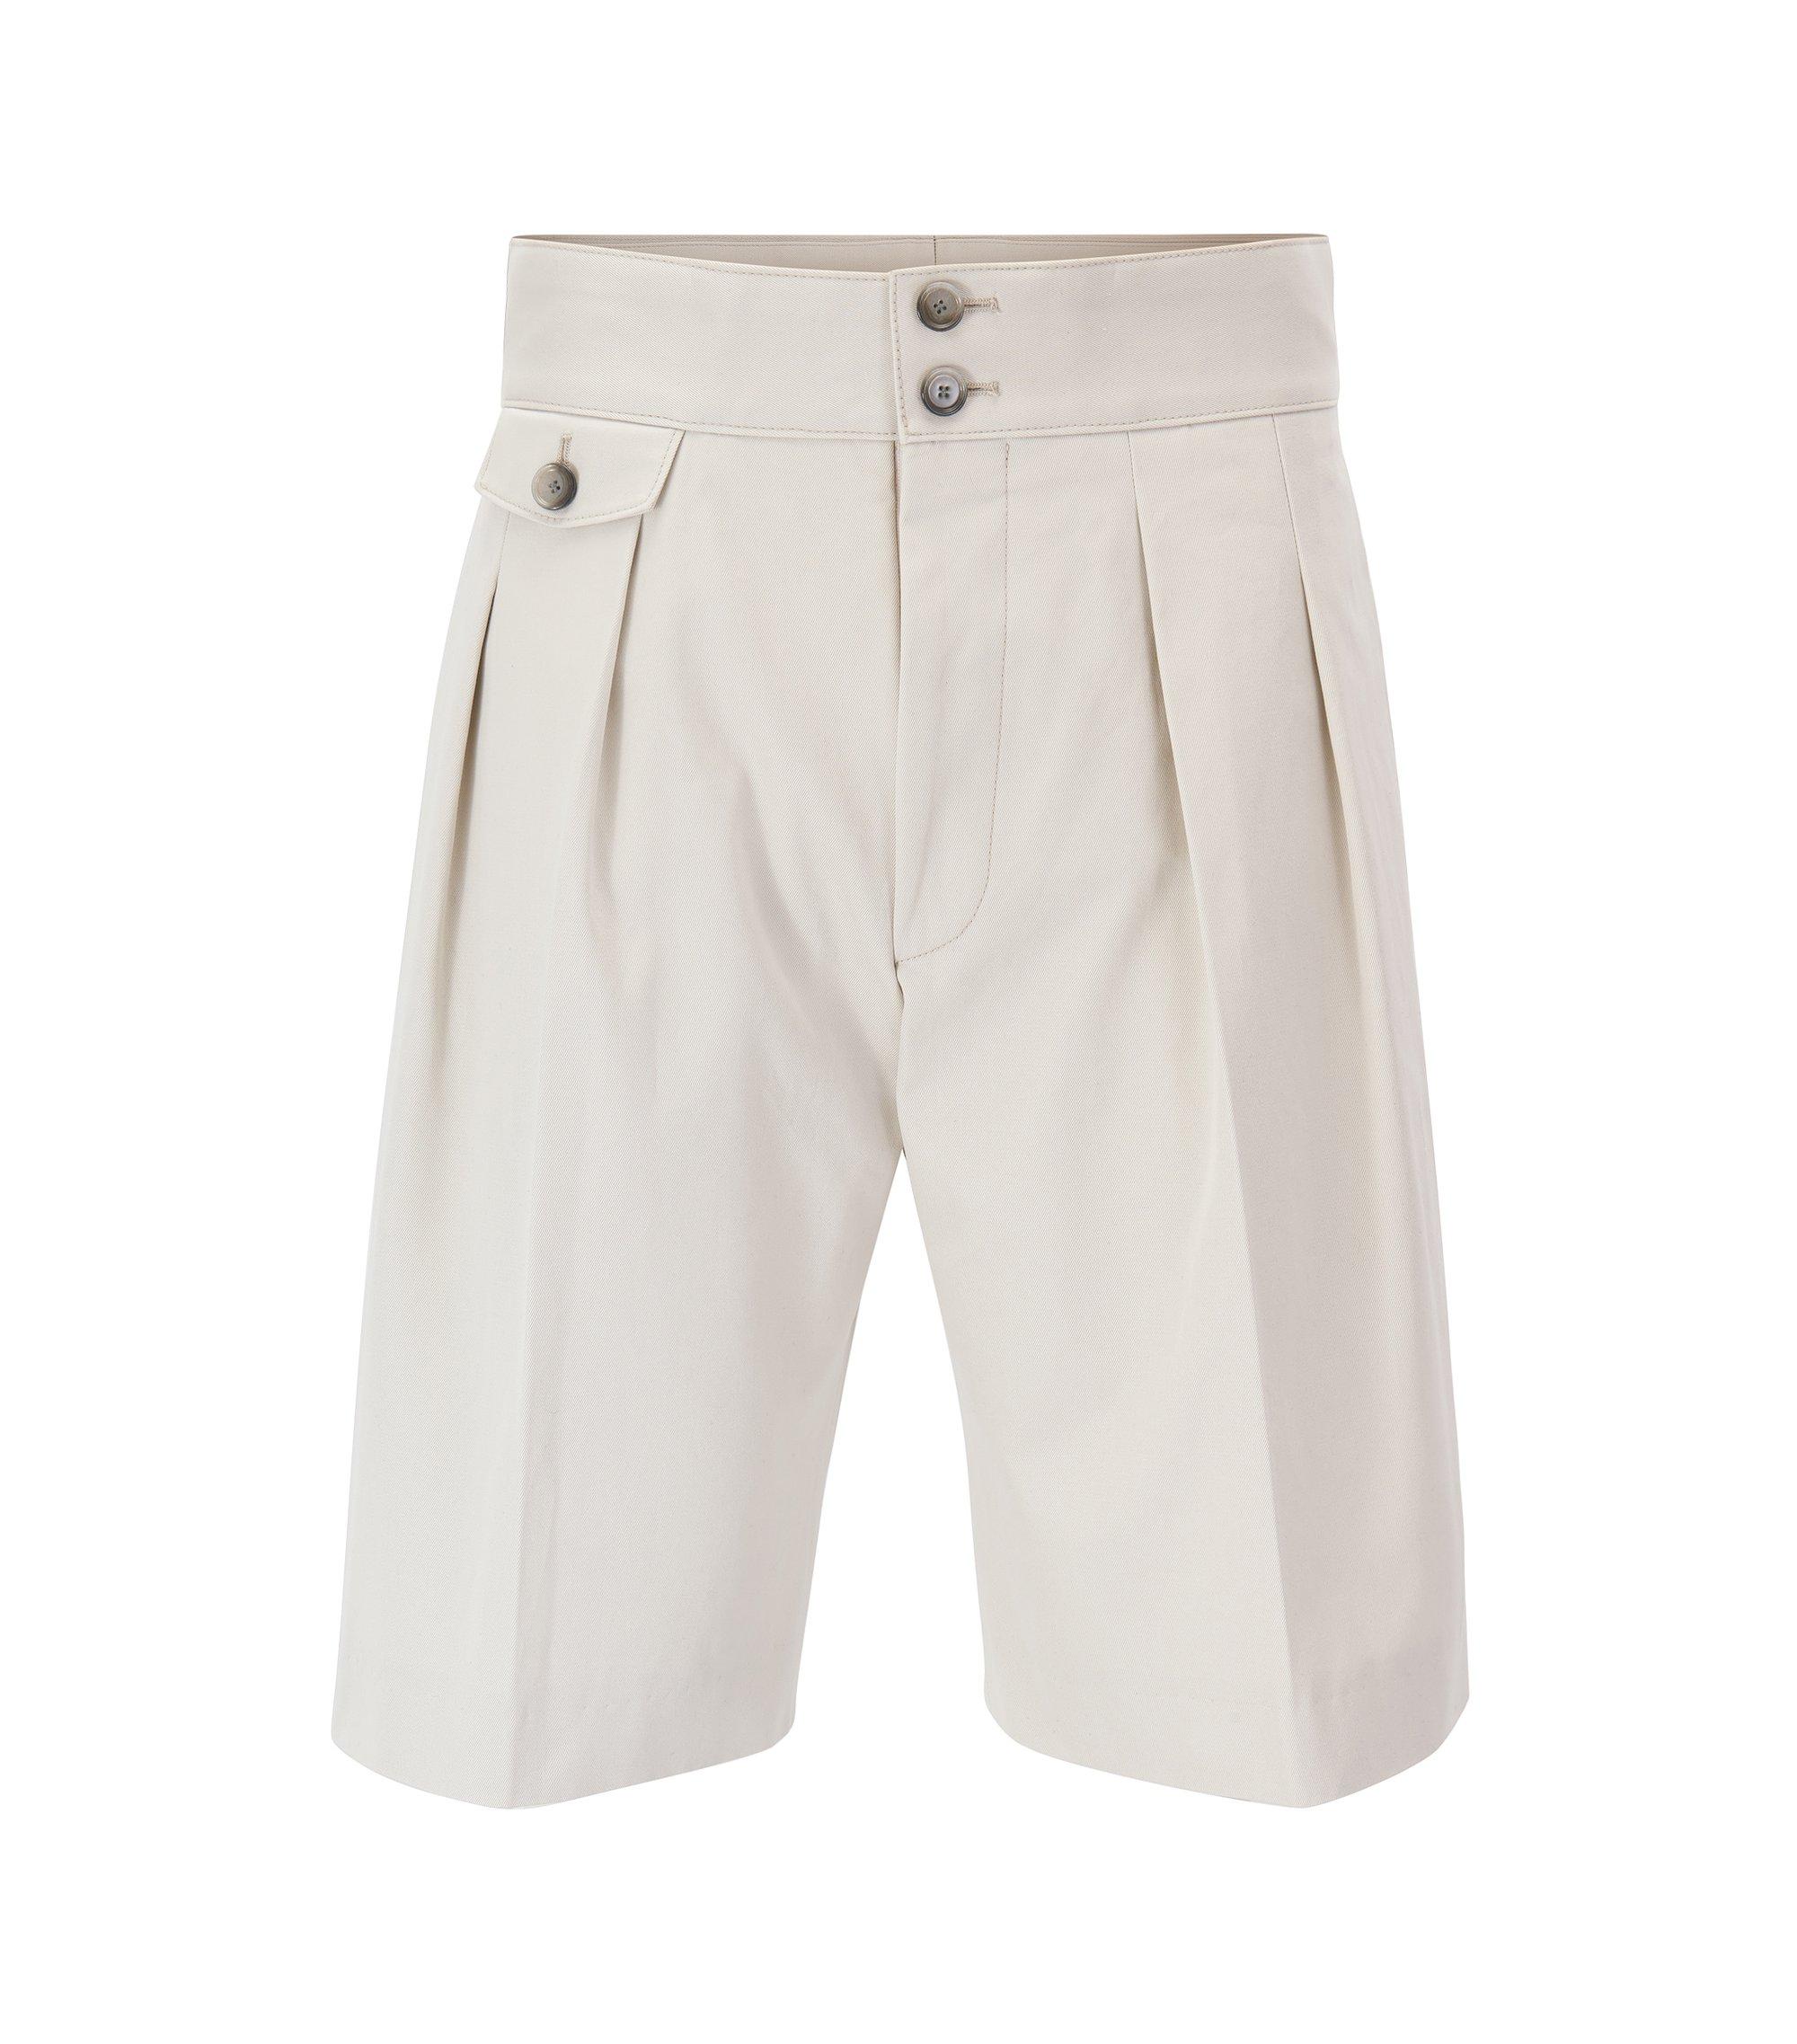 Shorts plisados en puro algodón de talle alto de la edición para pasarela, Natural